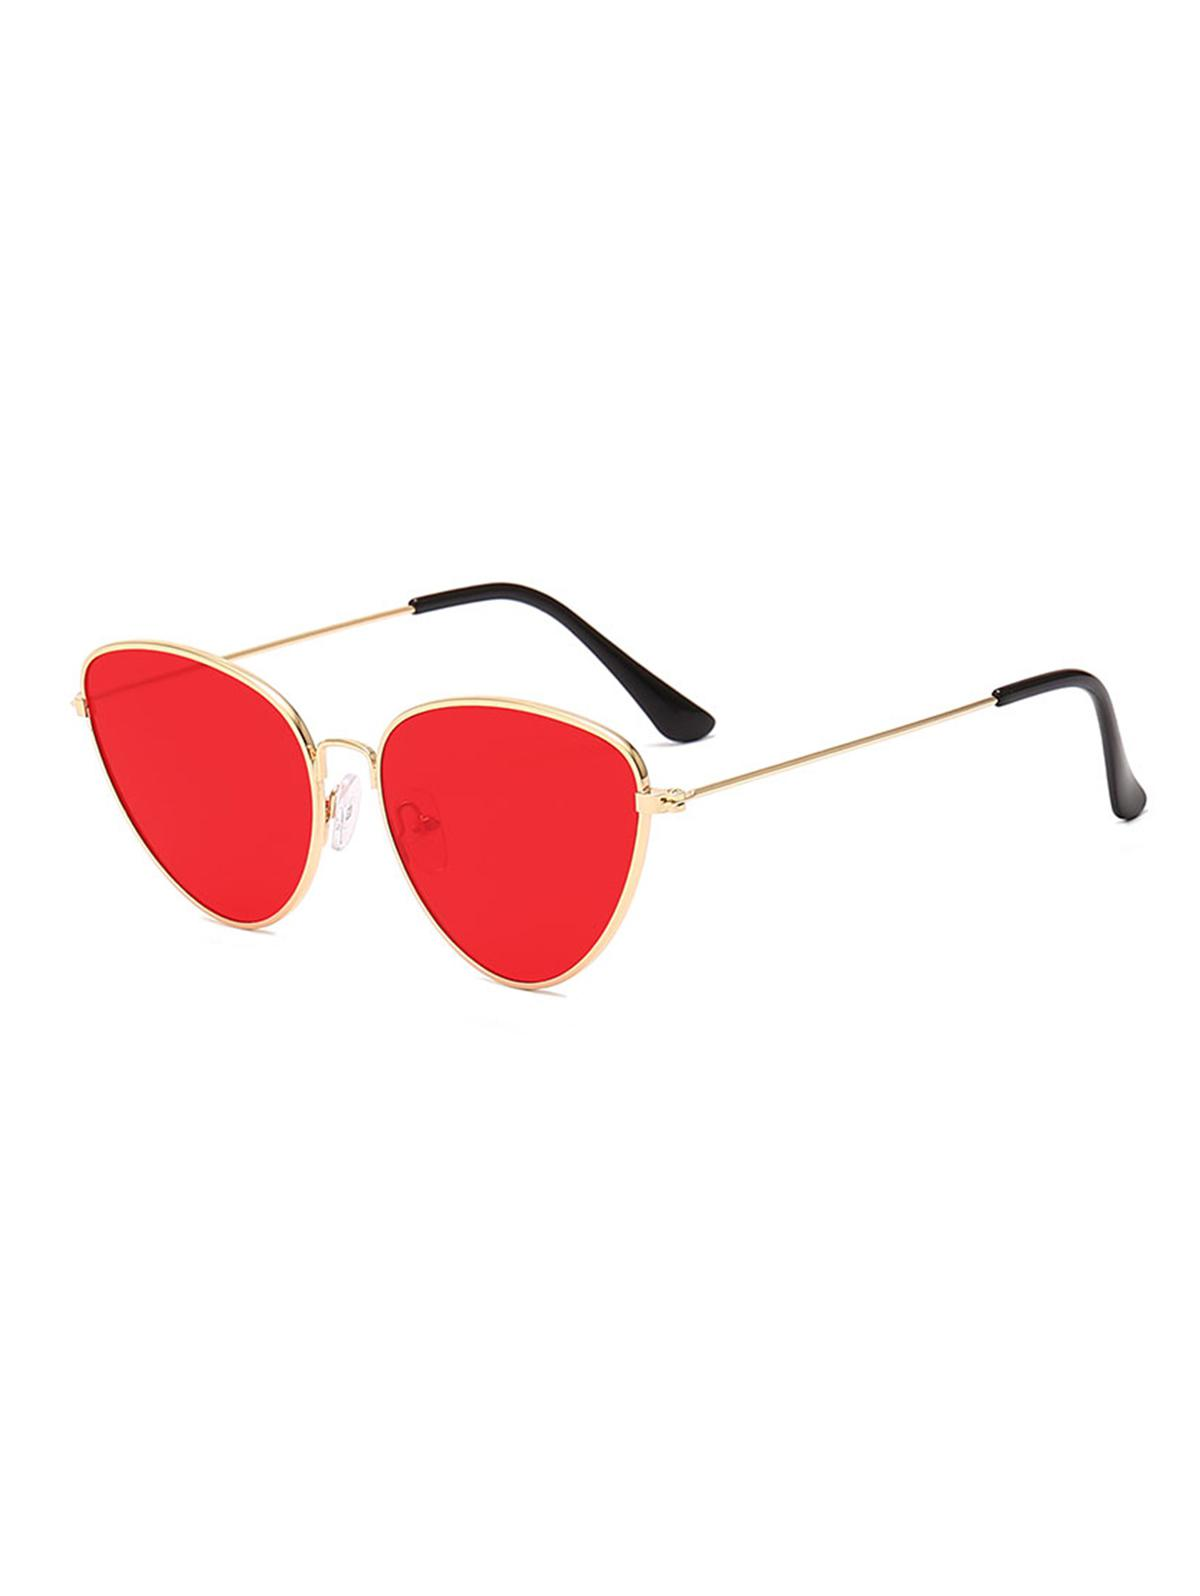 Outdoor Metal Triangular Pilot Sunglasses